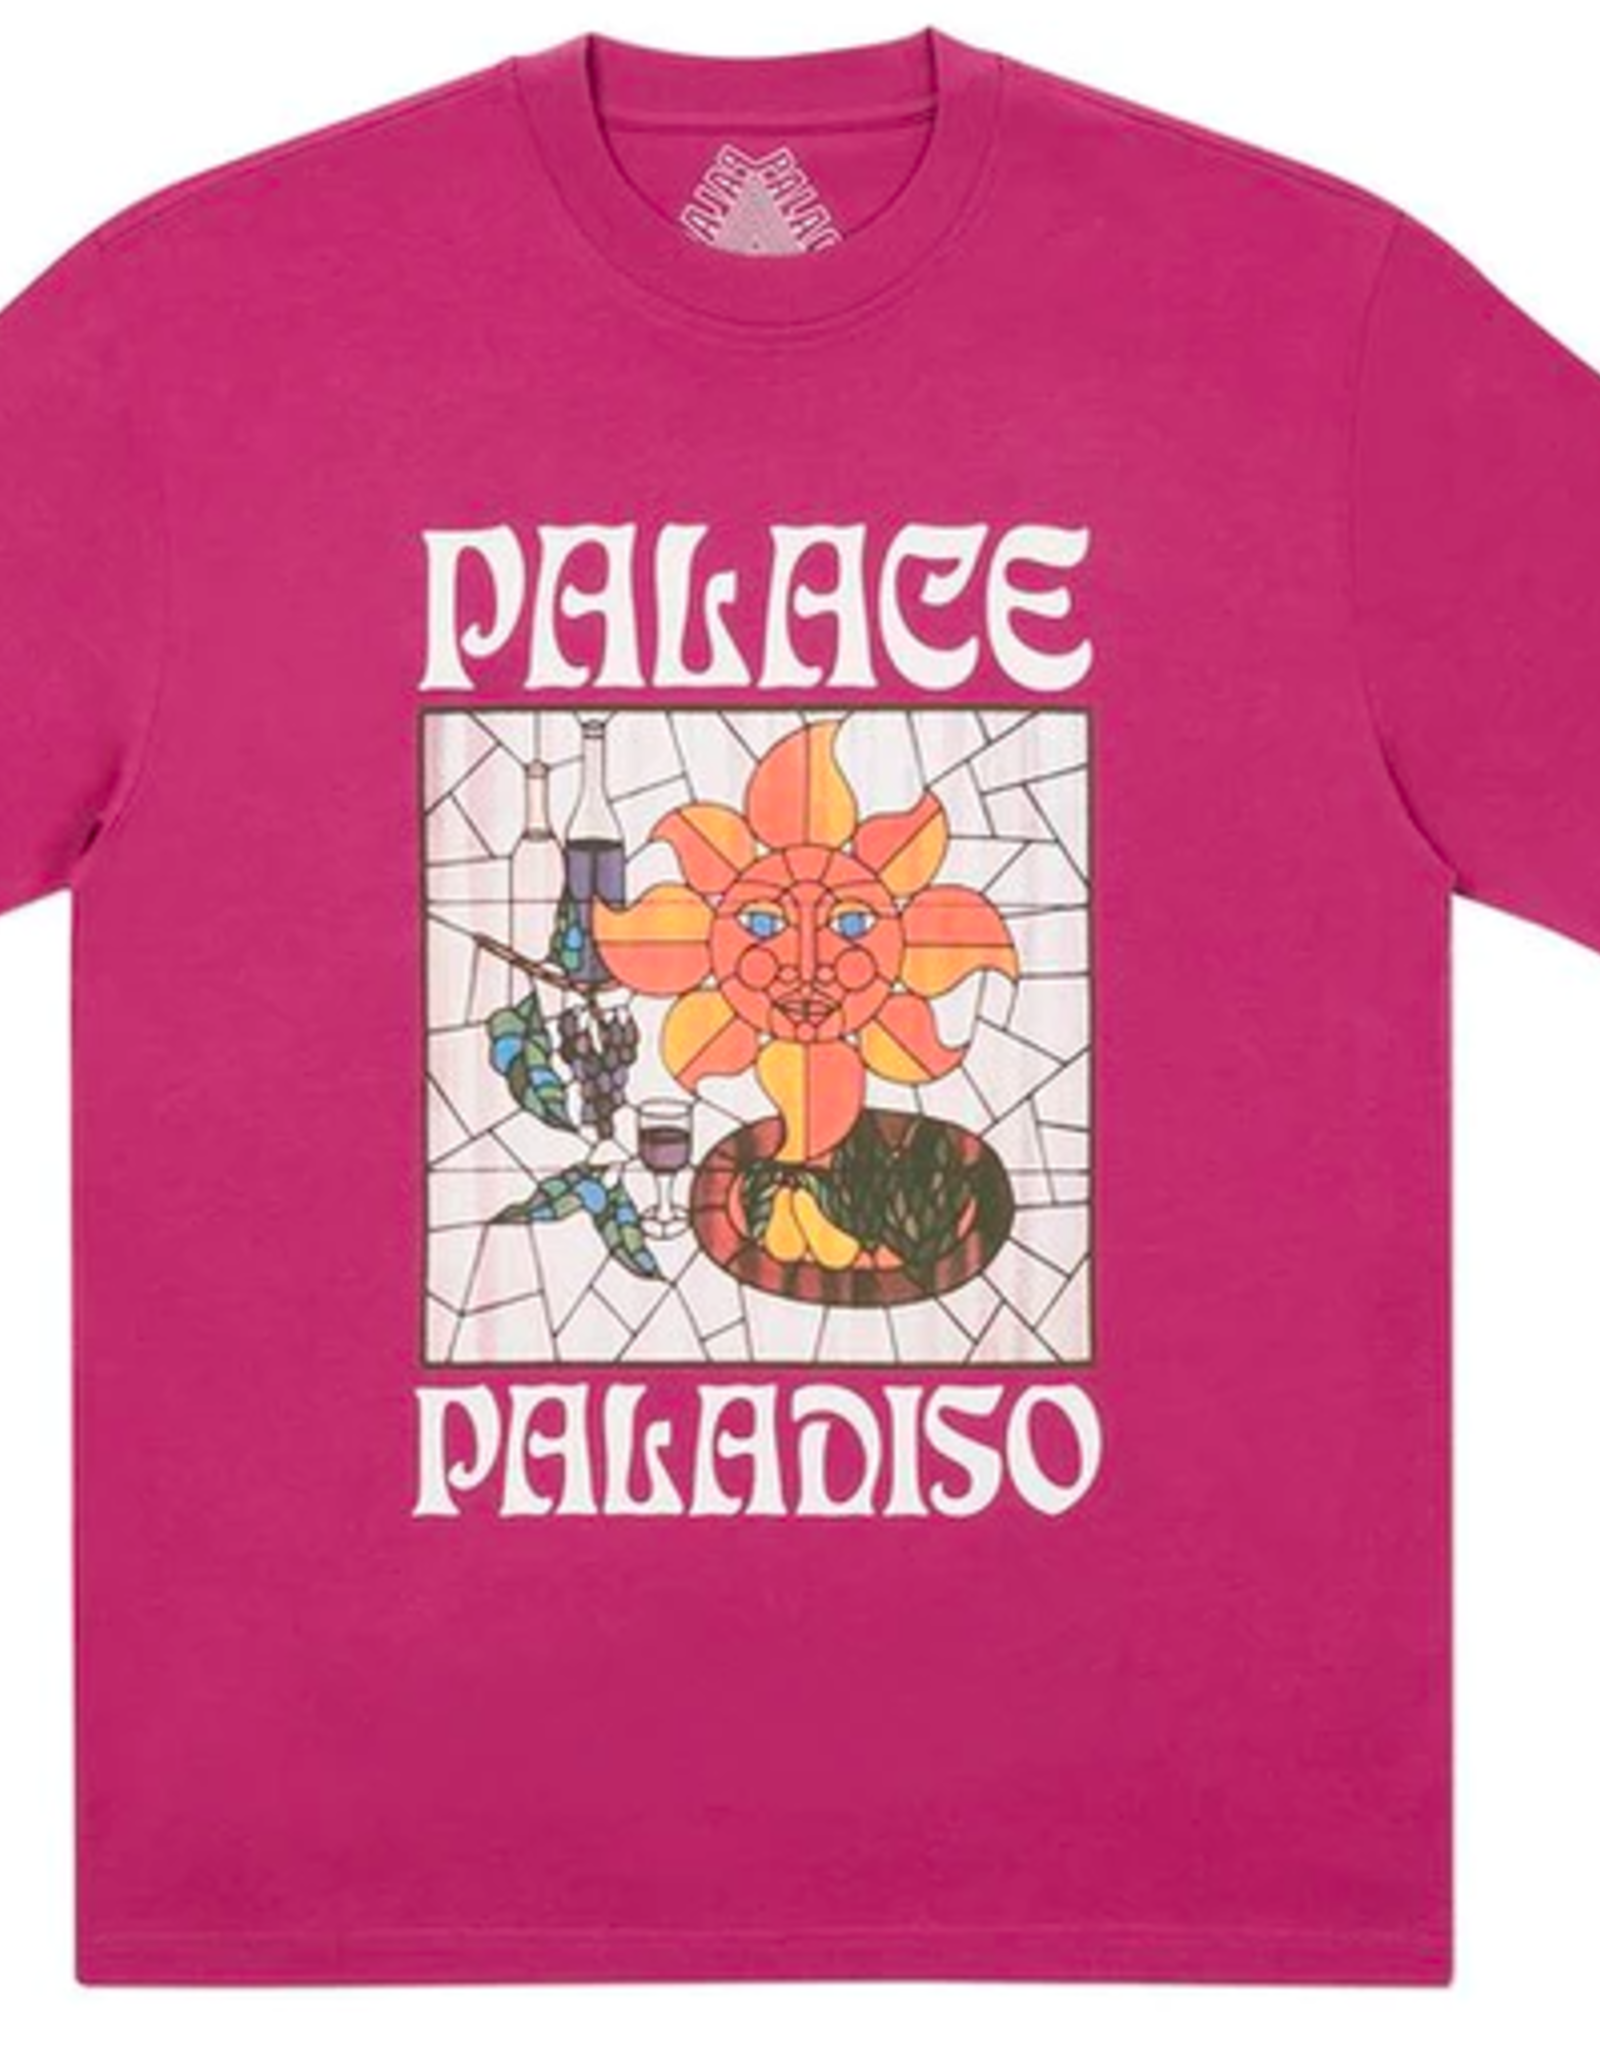 PALACE Palace Paladiso T-Shirt Wine - Medium